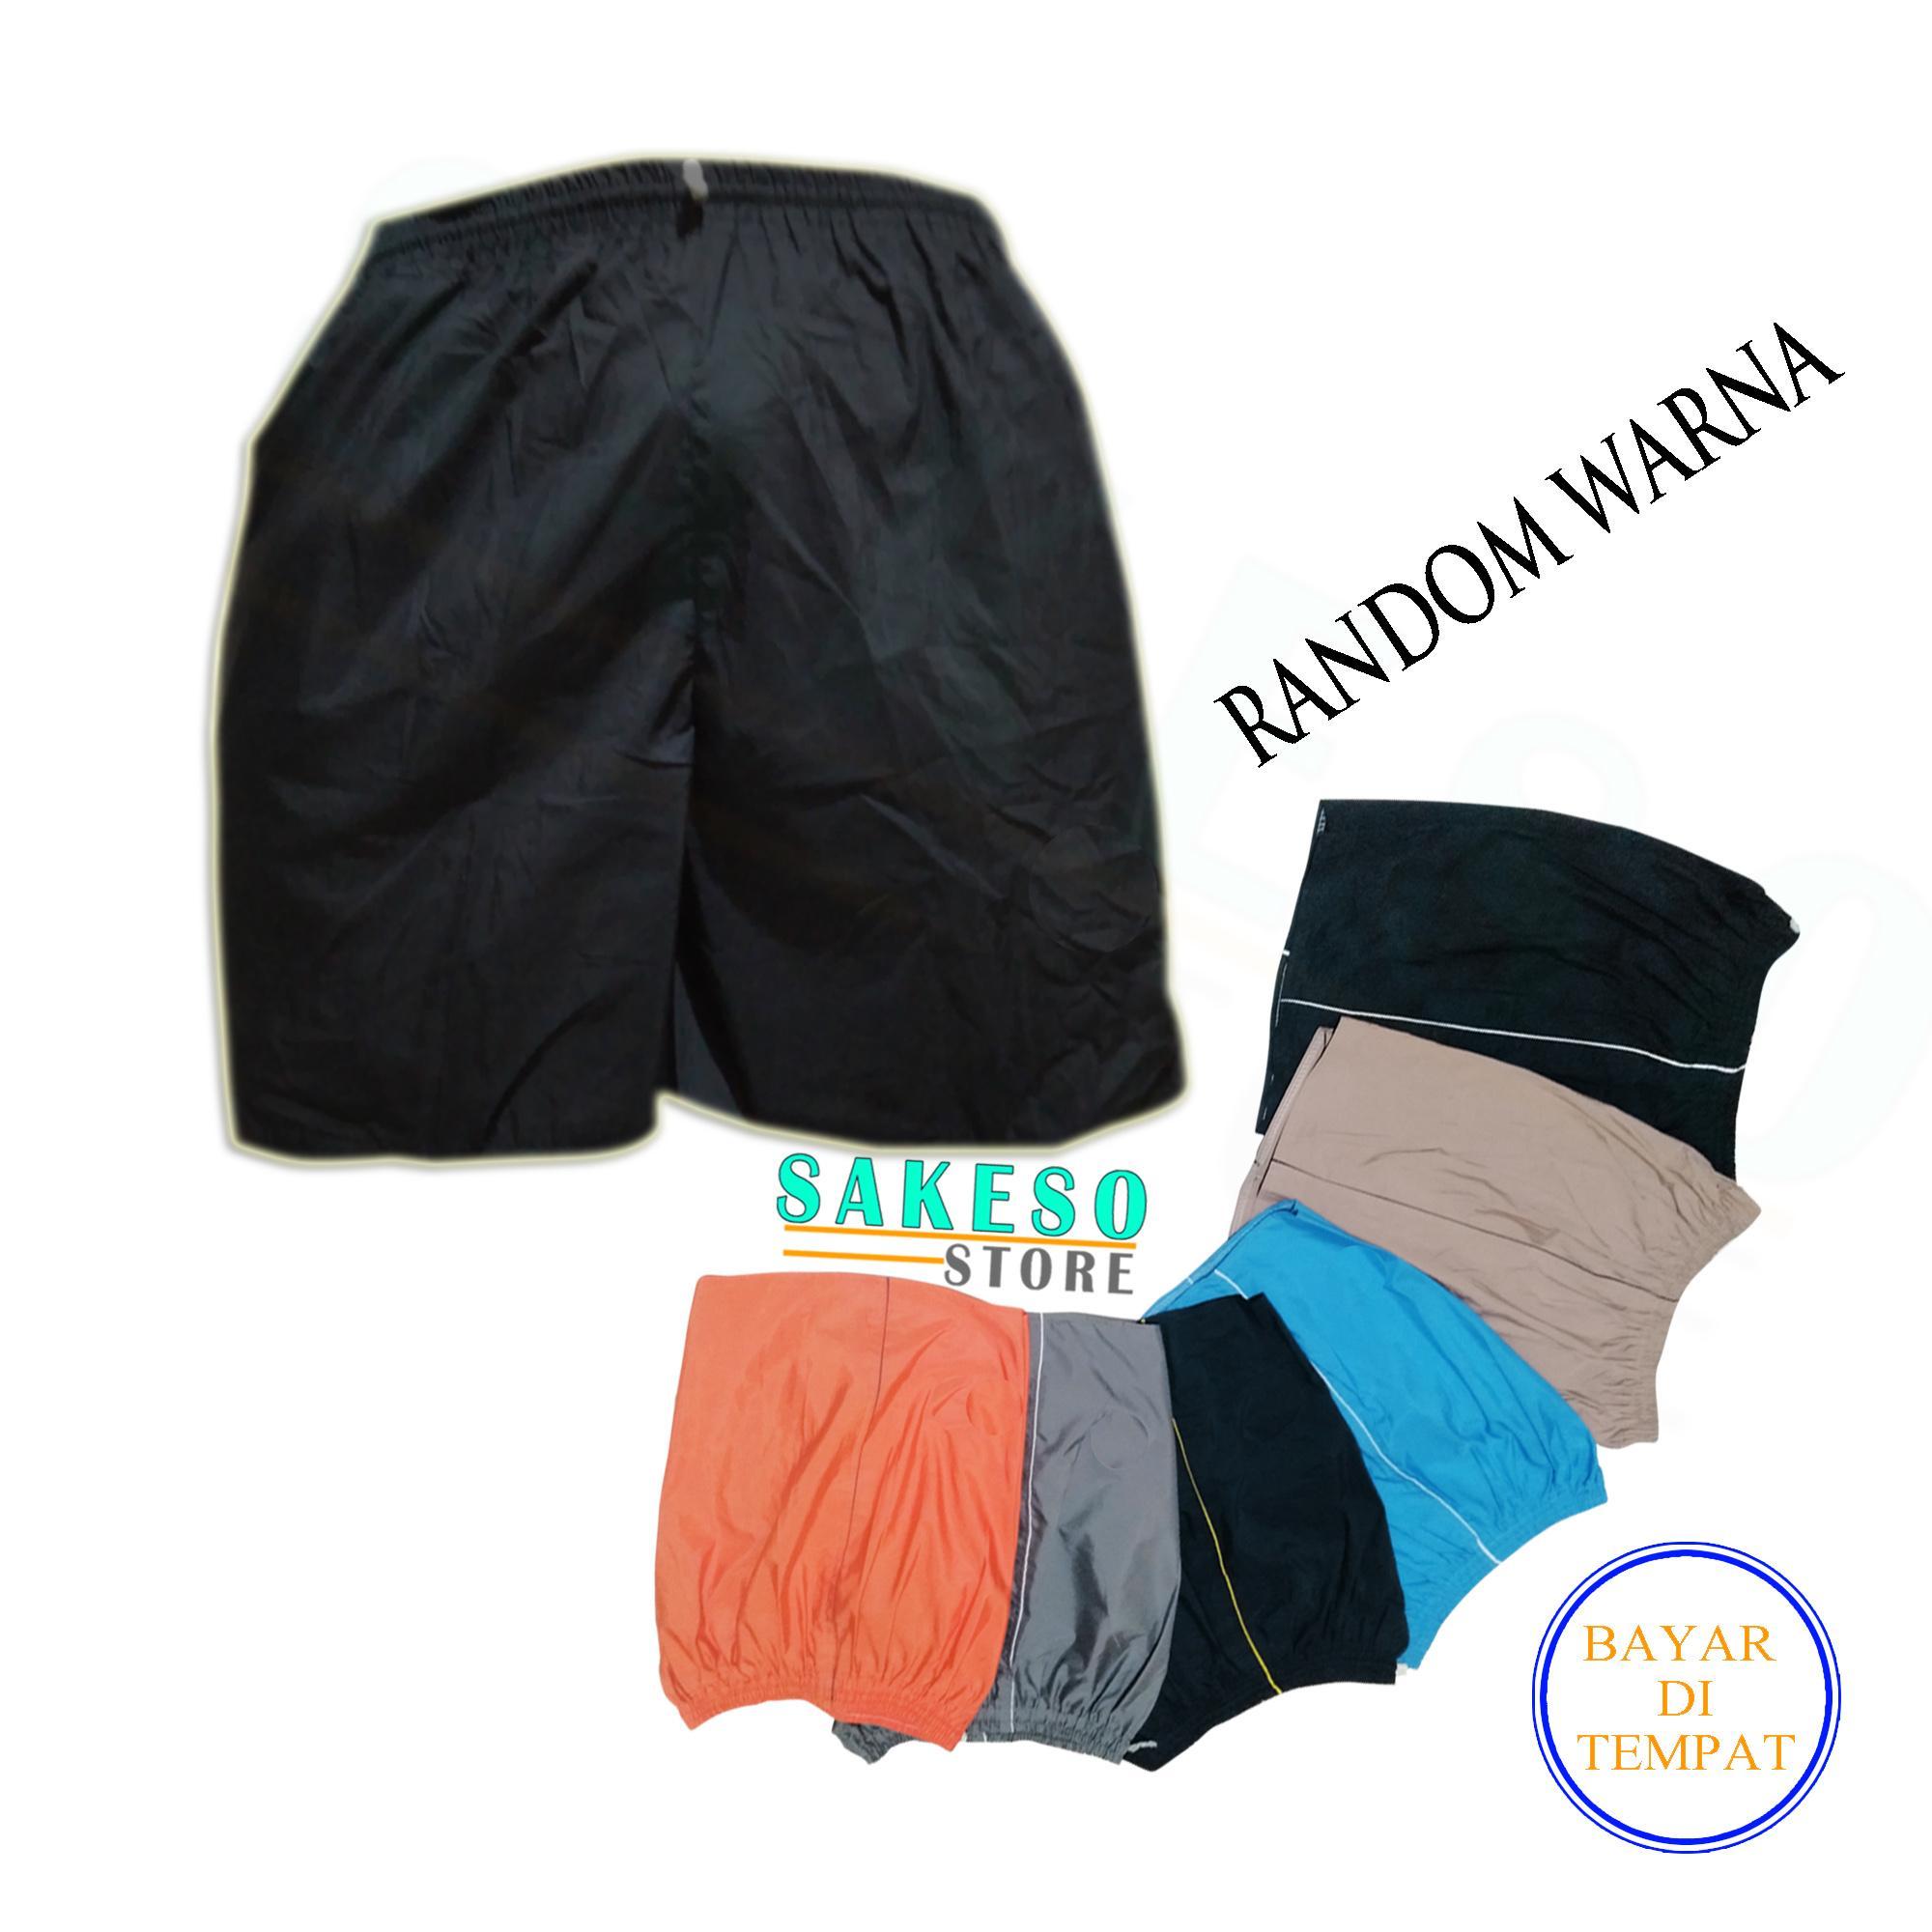 Sakeso - Celana Pendek - Celana Pendek Pria/Wanita - Harga Grosir